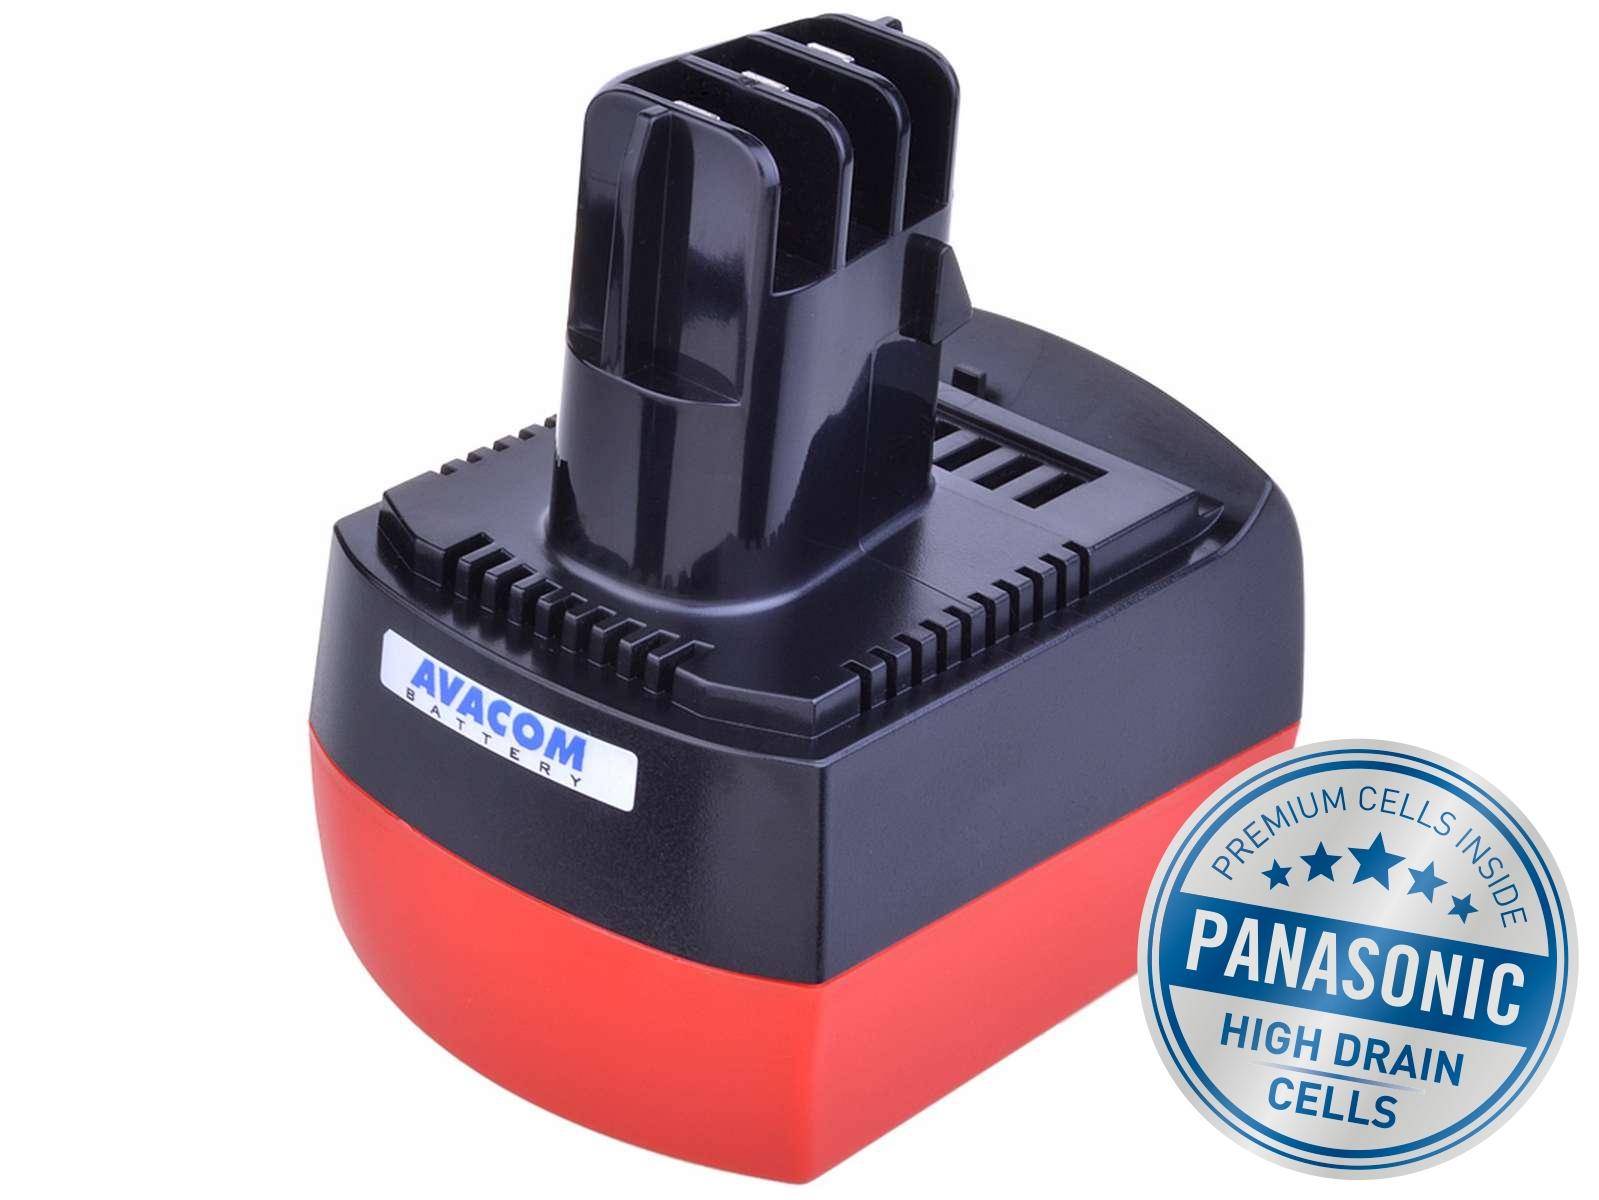 Baterie AVACOM METABO BSZ 6.25473 Ni-MH 12V 3000mAh, články PANASONIC - ATME-12Mh-30H